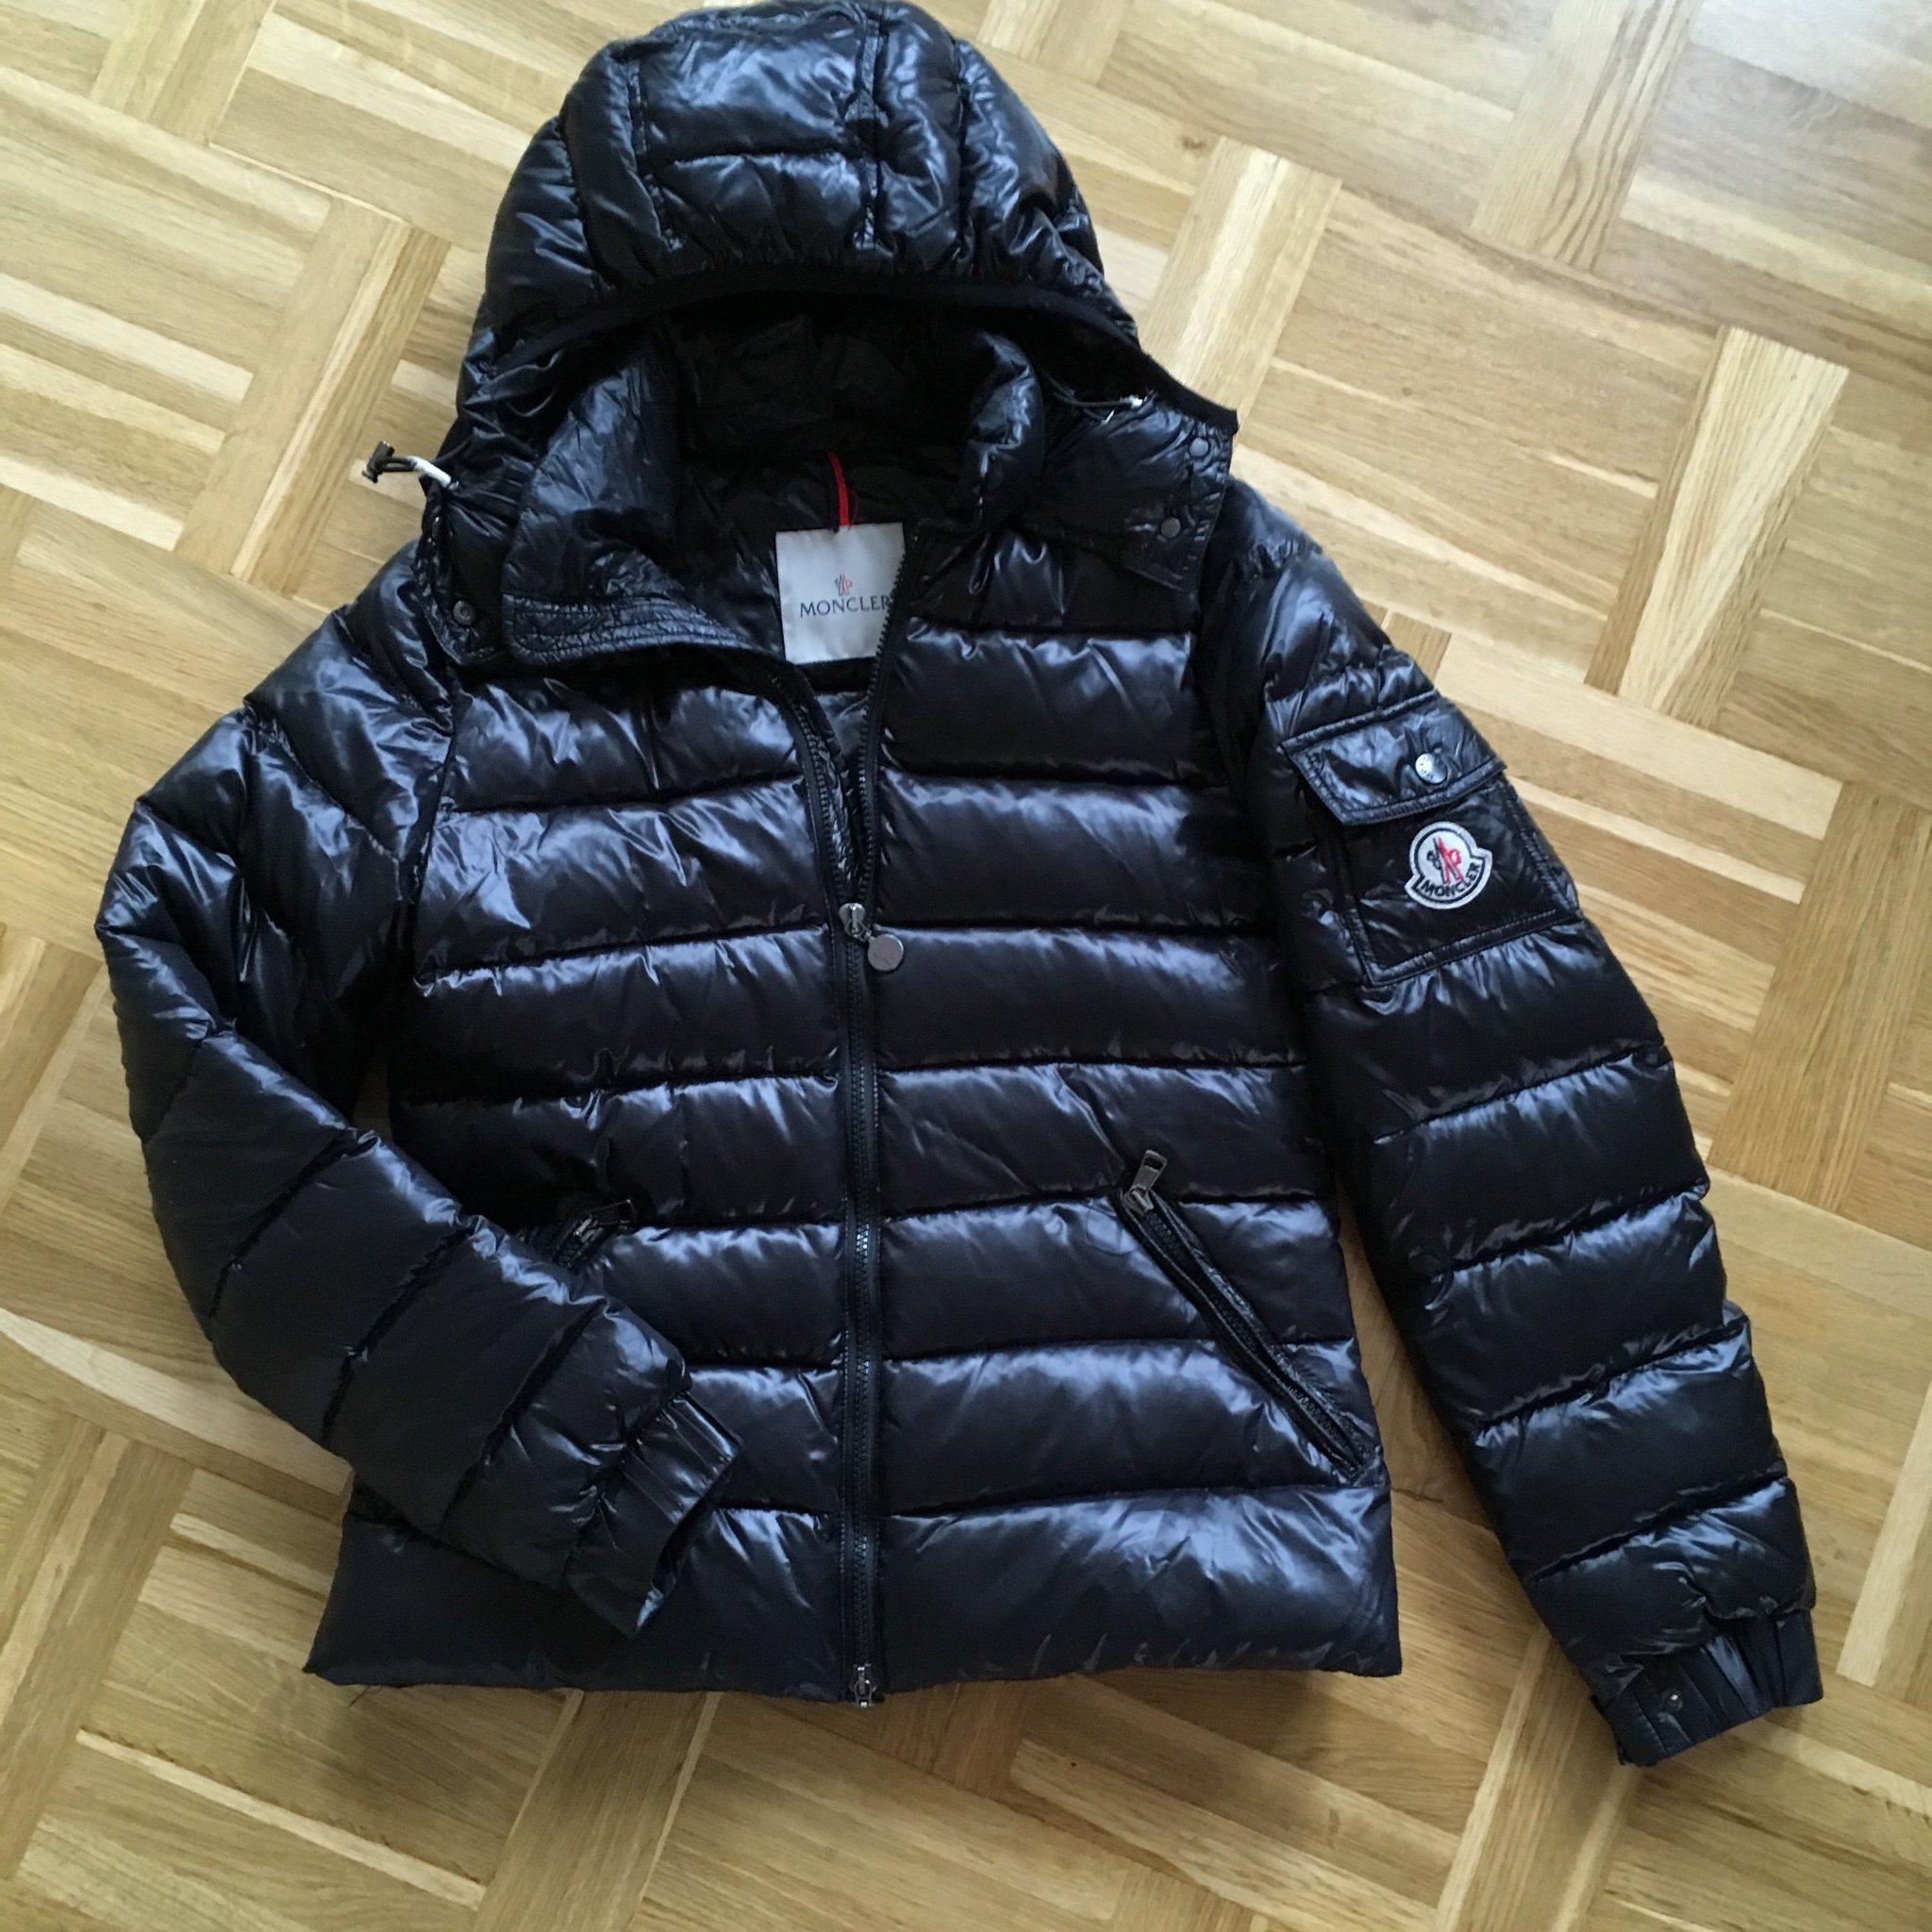 Moncler Jacka (340985142) ᐈ Köp på Tradera 30eefea86622d